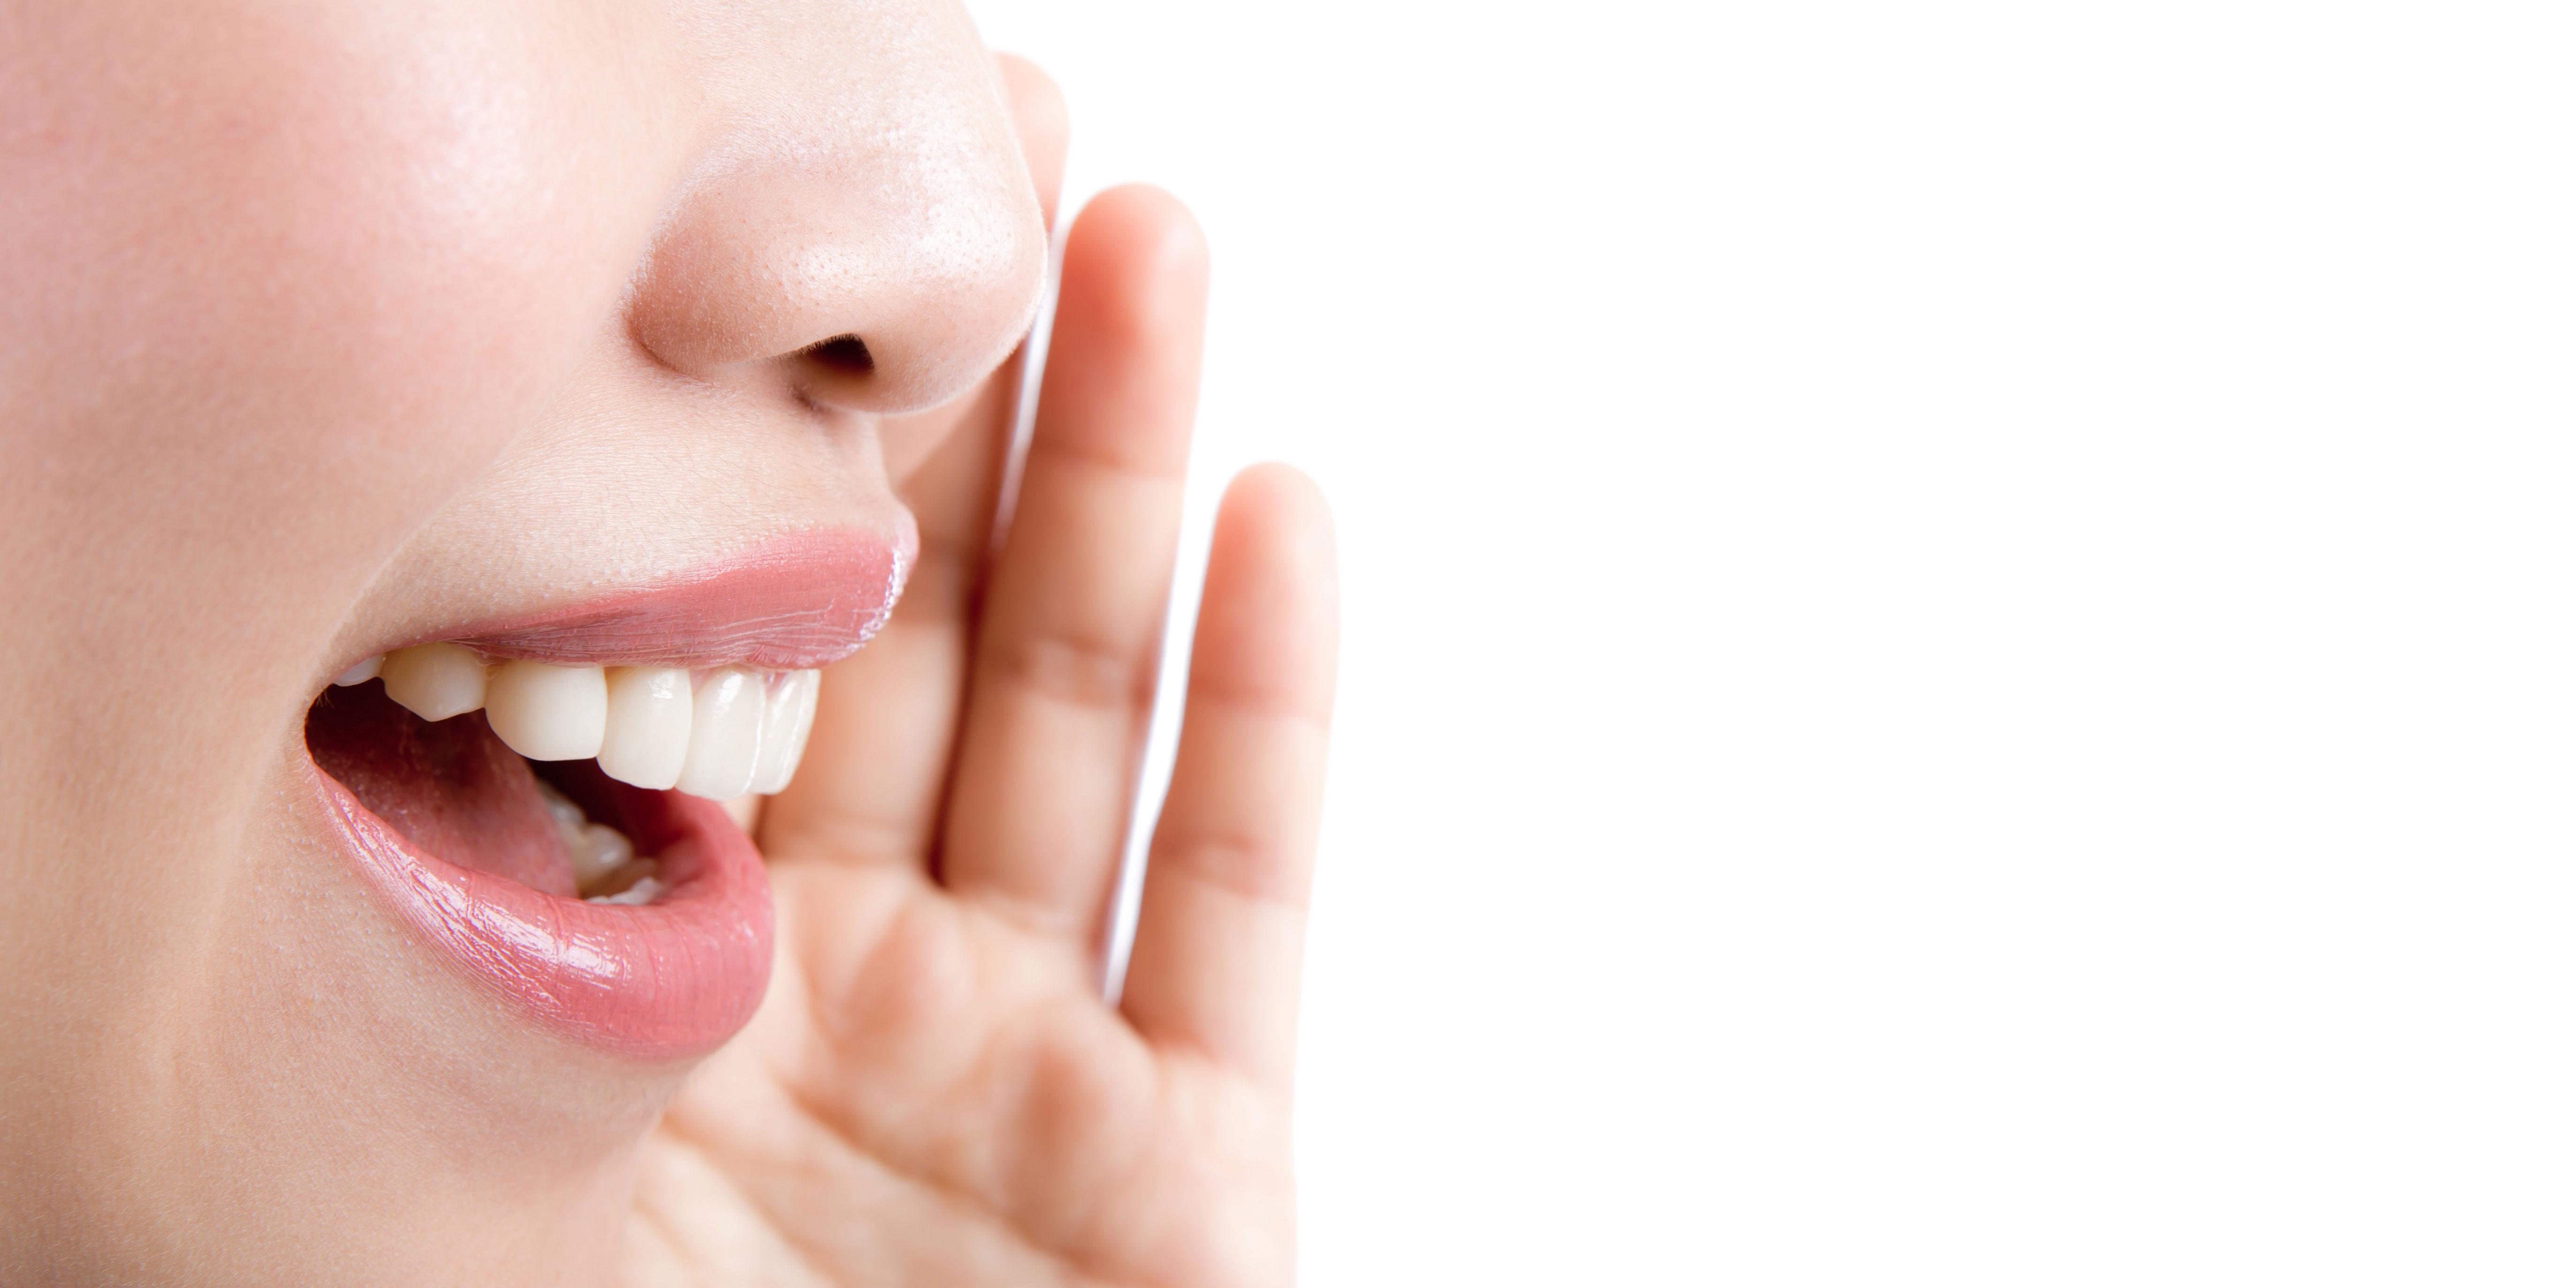 Mengenal Proses Sulam Bibir Elips